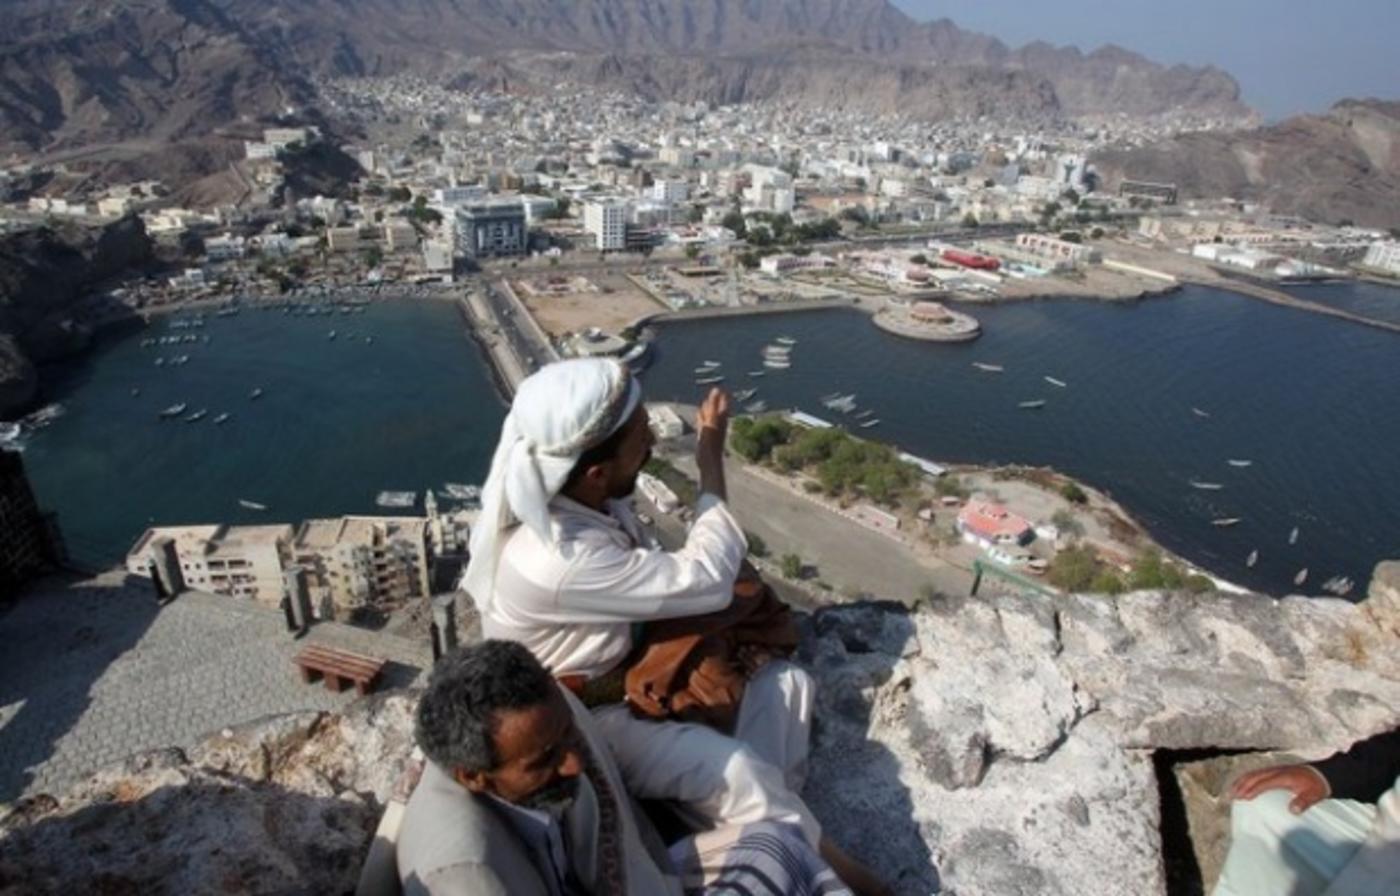 Yemenis divided over capital: ...